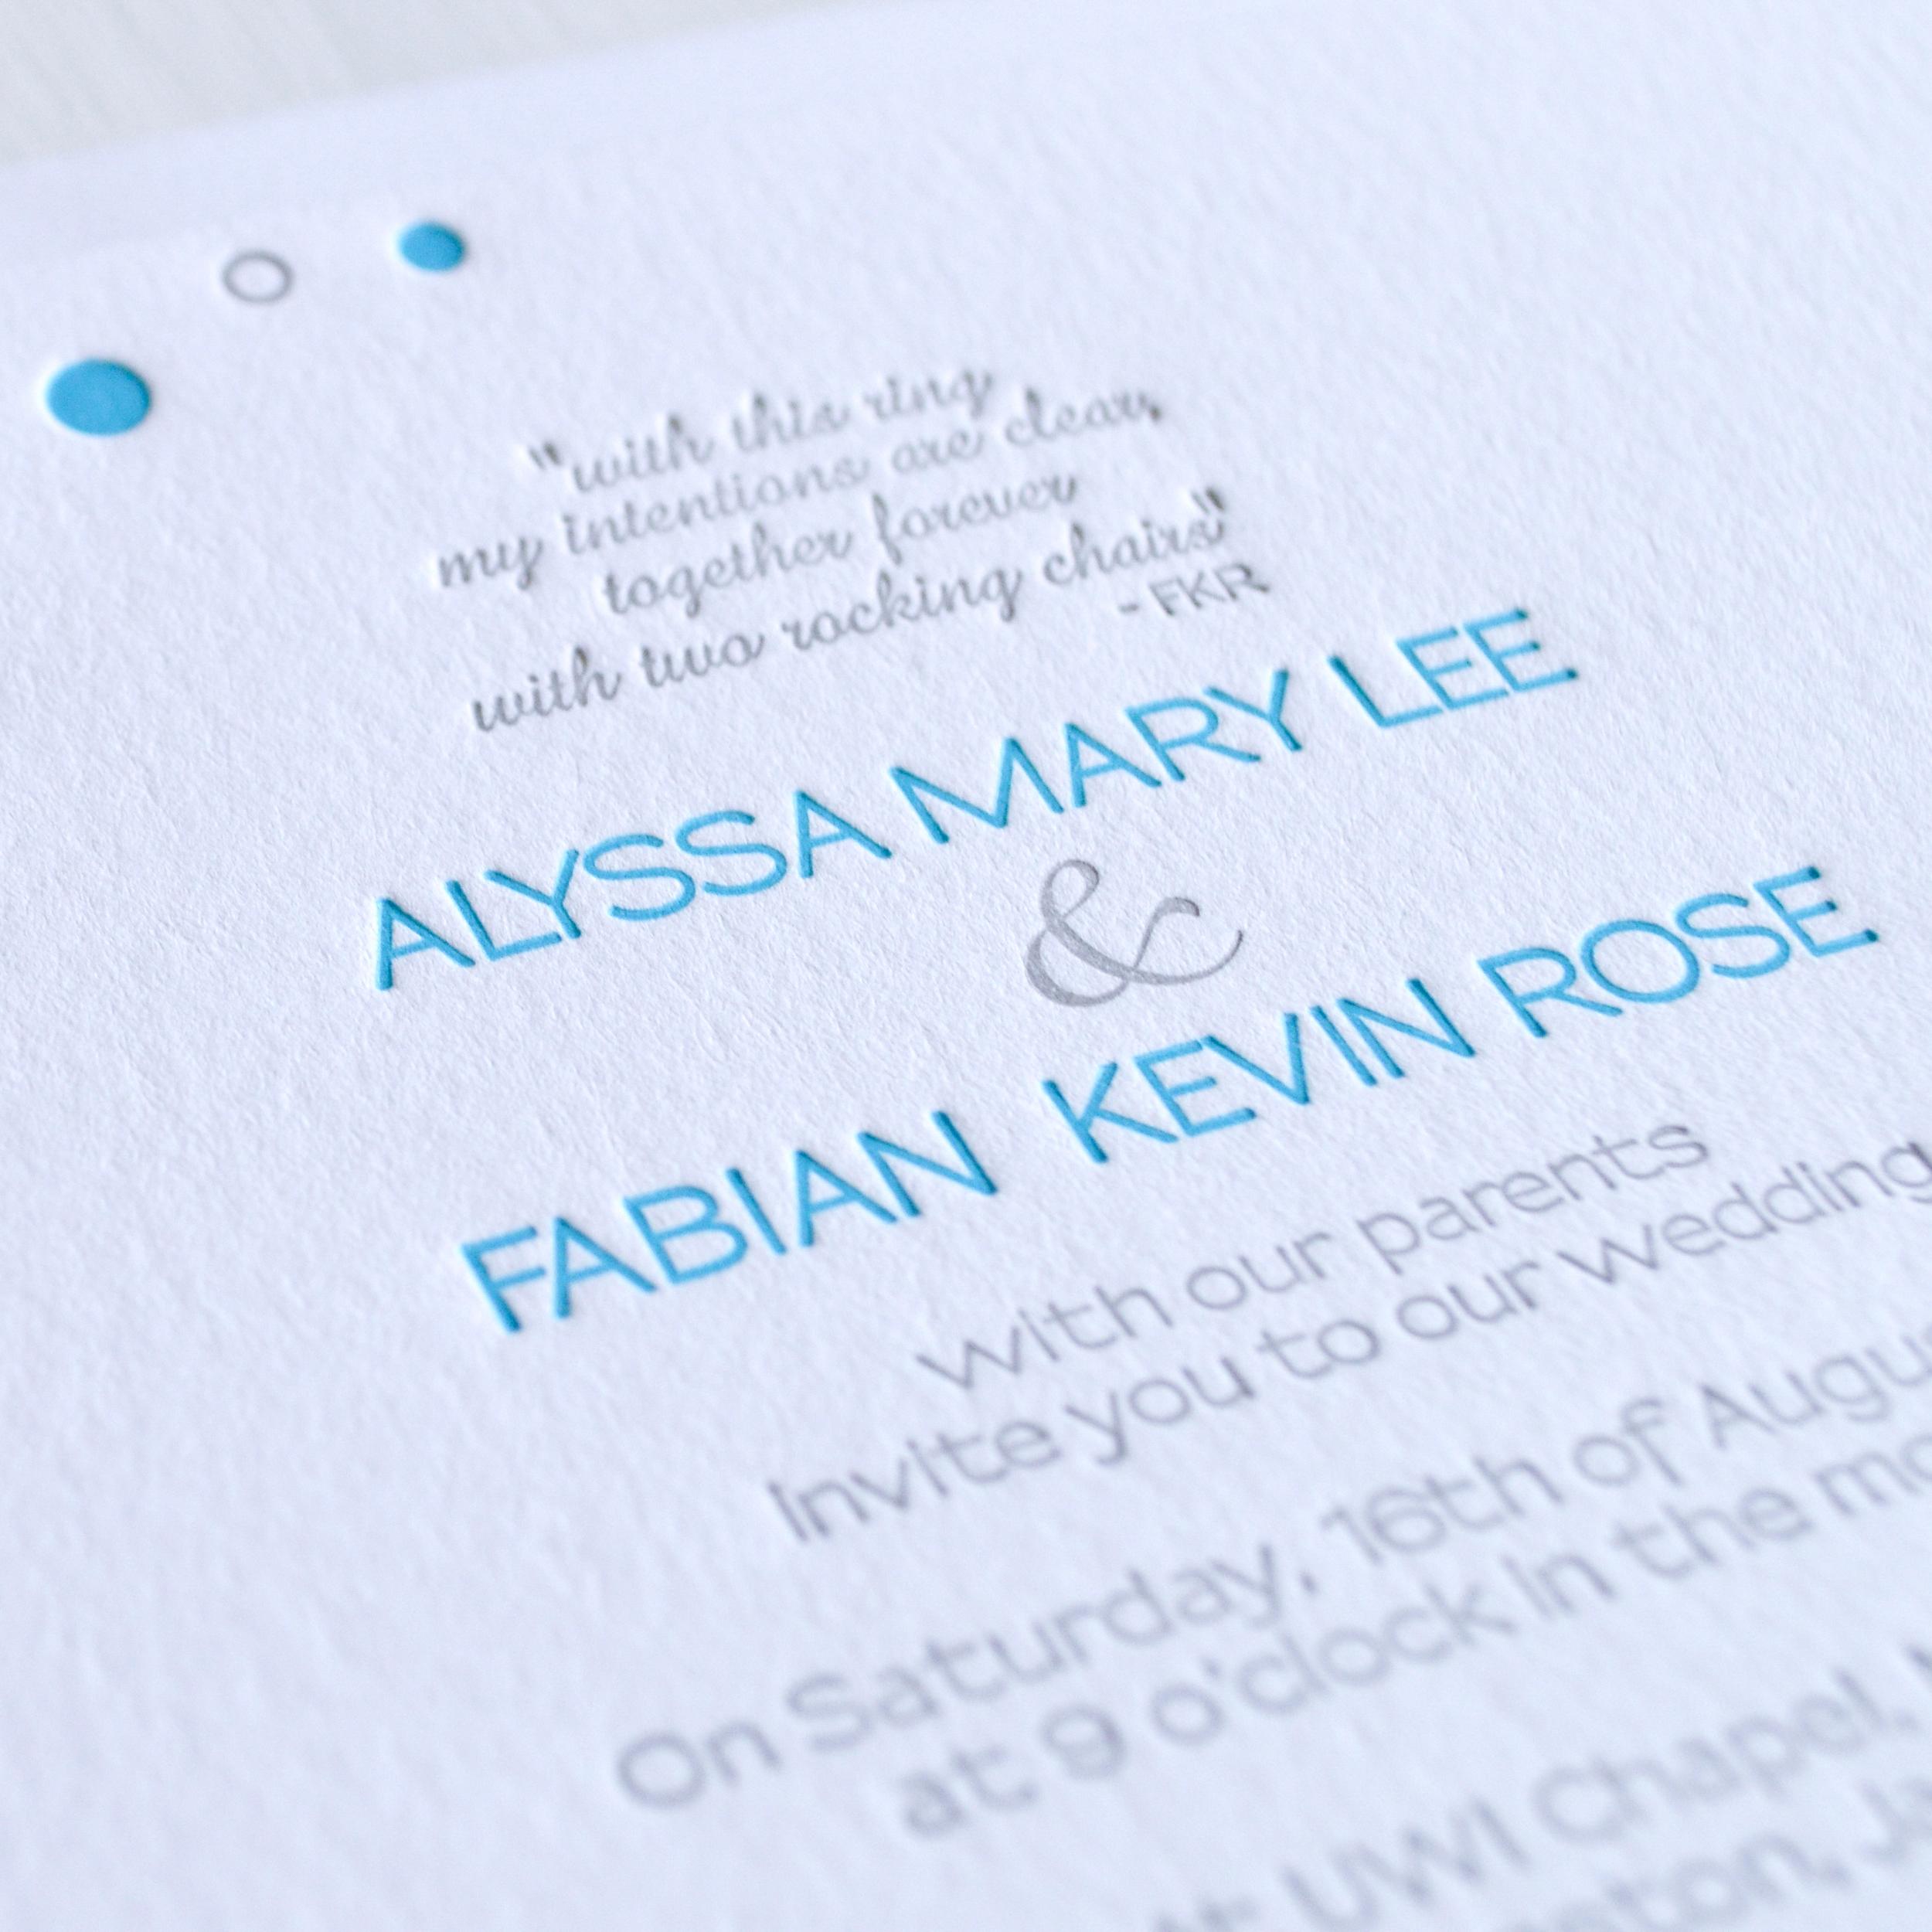 teal and grey backyard bbq letterpress wedding invitation 2.jpg